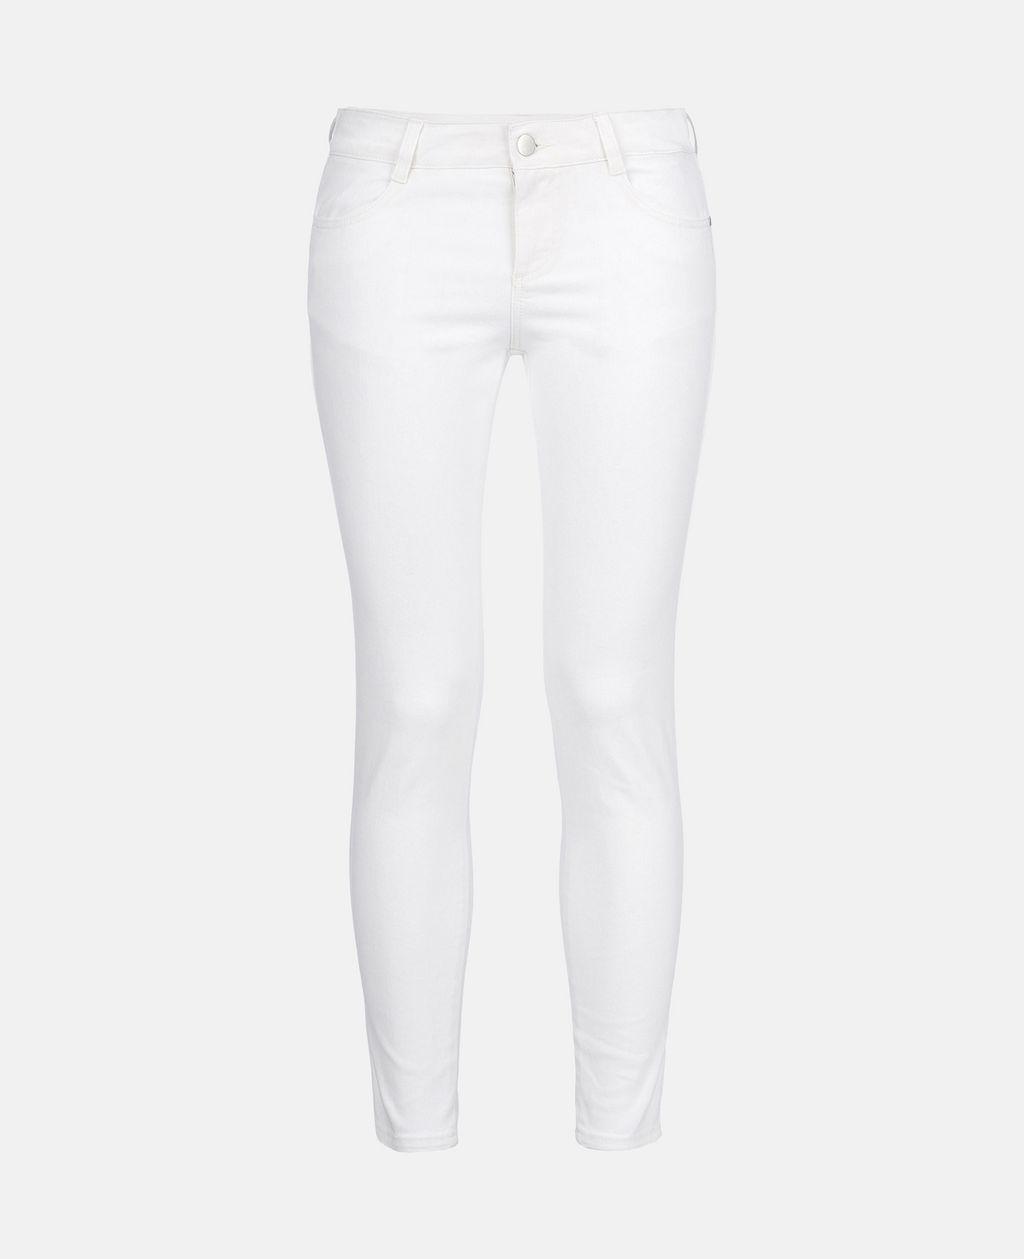 White Skinny Ankle Grazer - STELLA MCCARTNEY